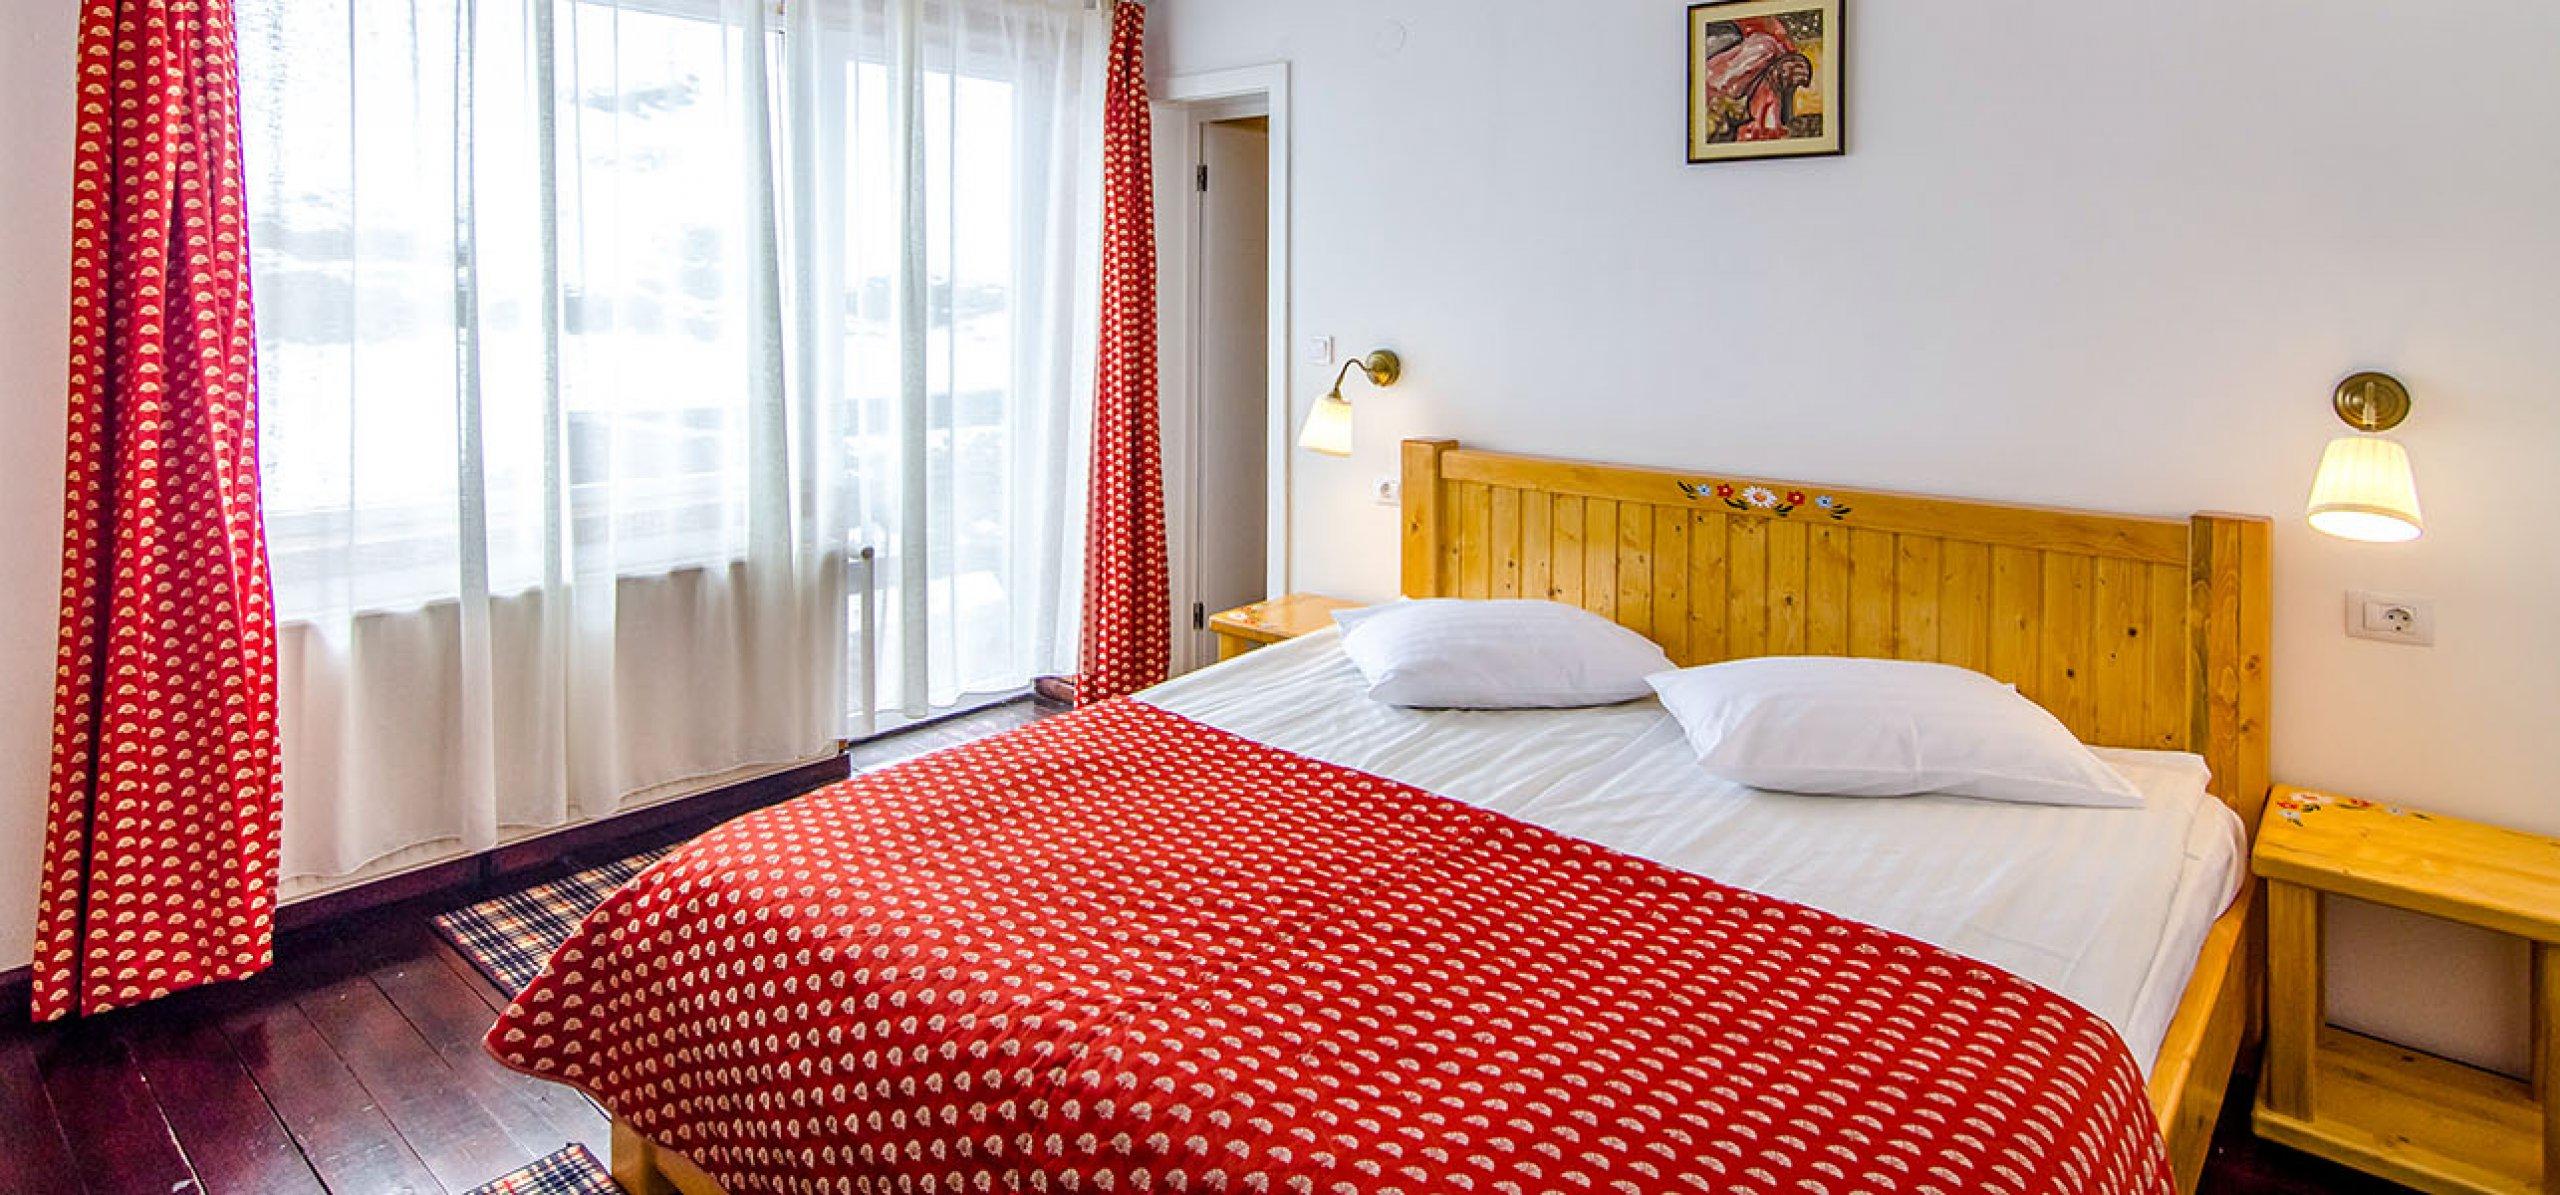 camera-dubla-matrimoniala-luminoasa-hotel-cheia-hoteluri-moeciu